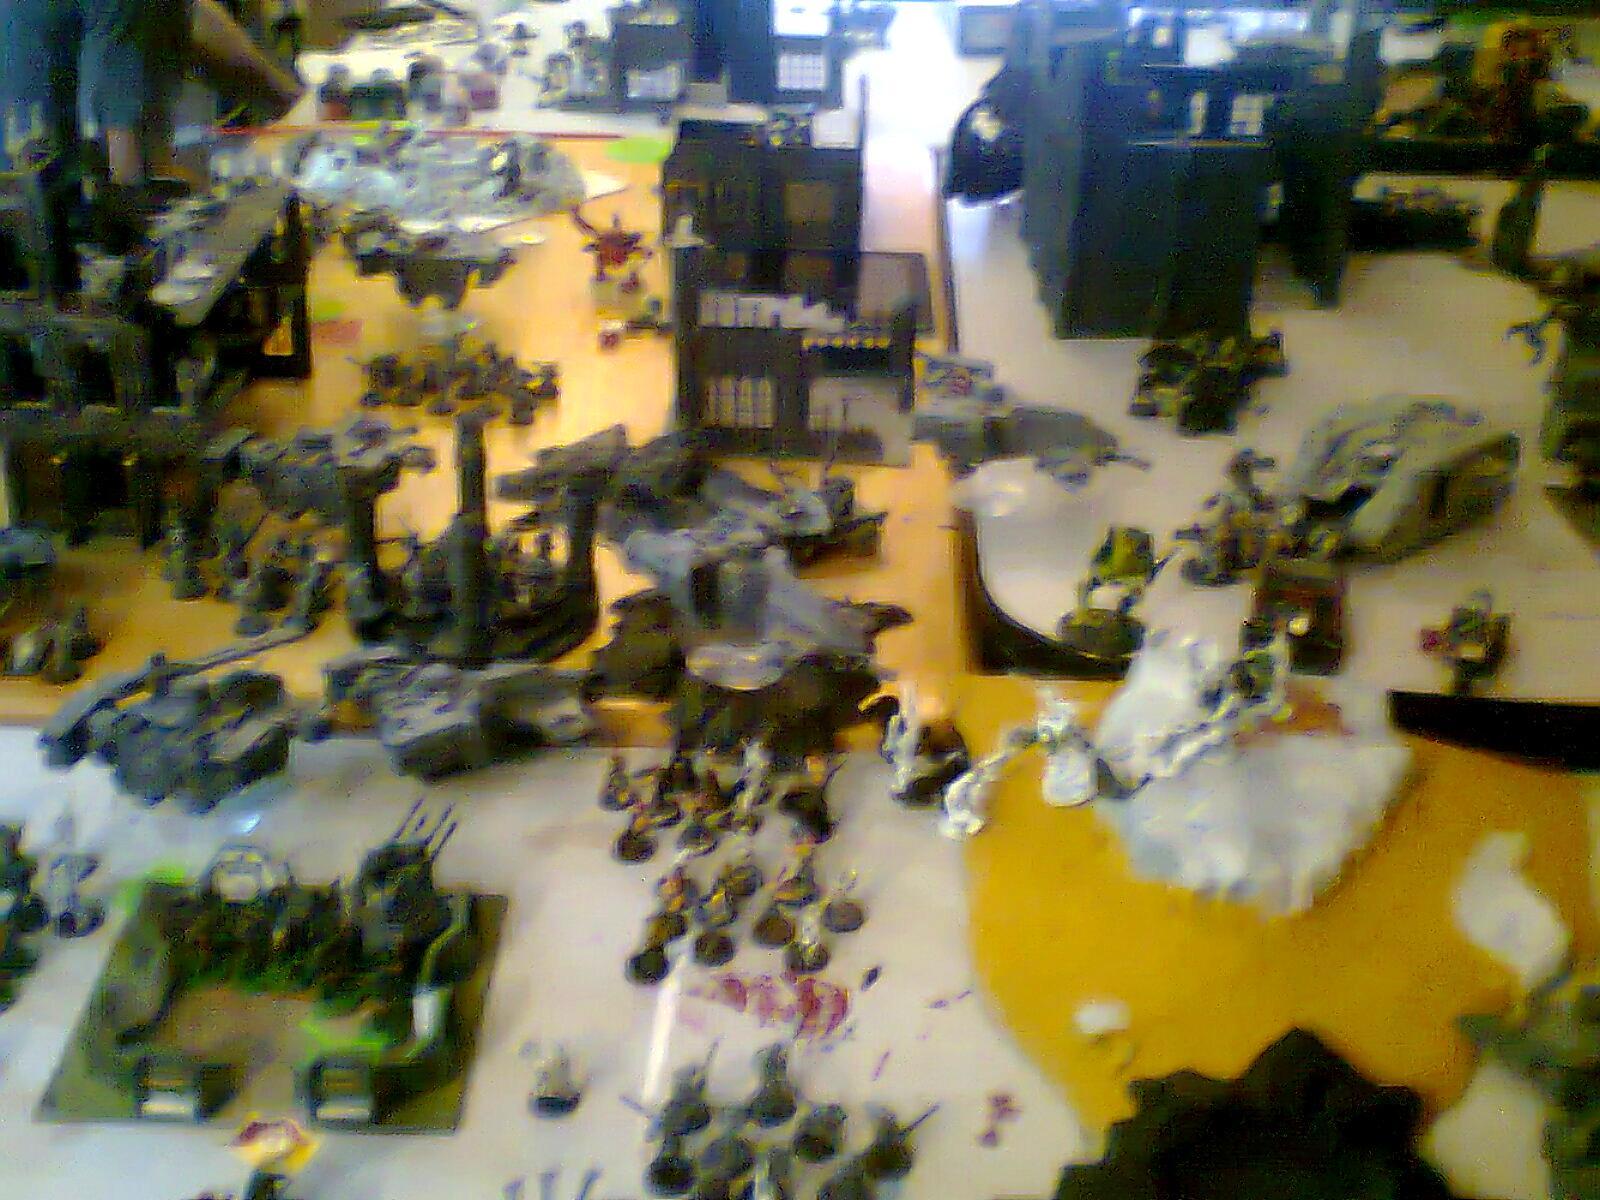 Apocalypse, Imperial Guard, Necrons, Orcs, Orks, Tau